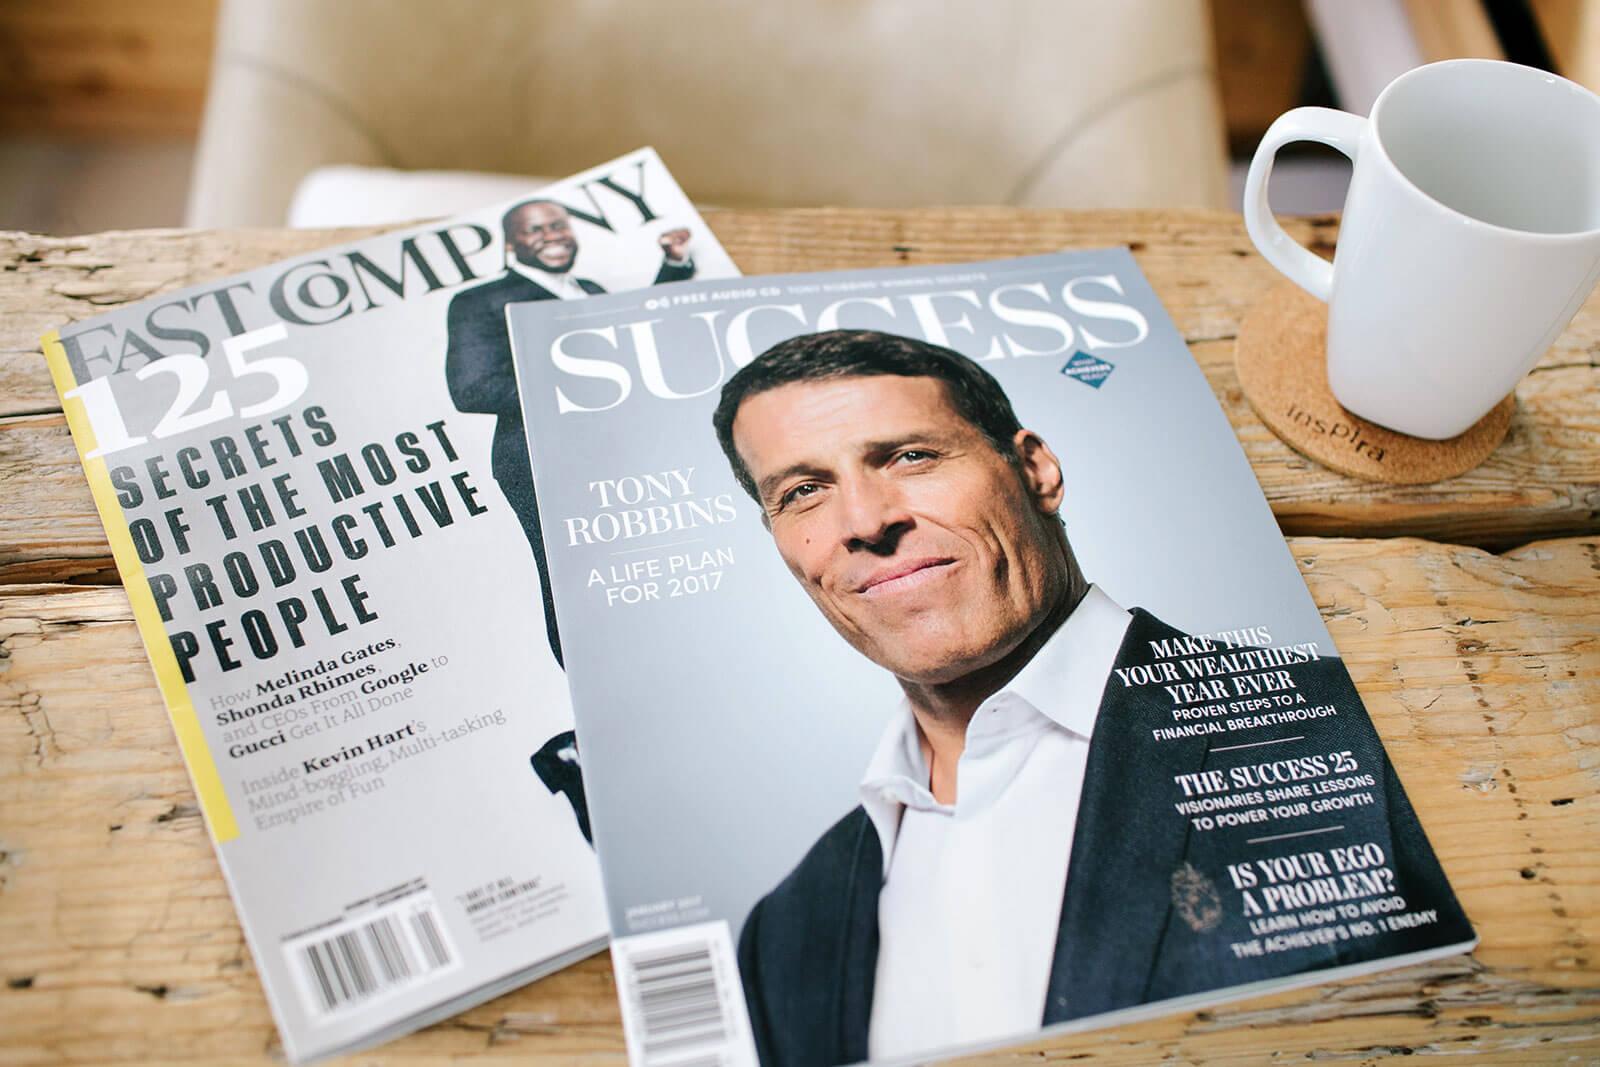 Revista Success sobre Tony Robbins sobre mesa de madeira.